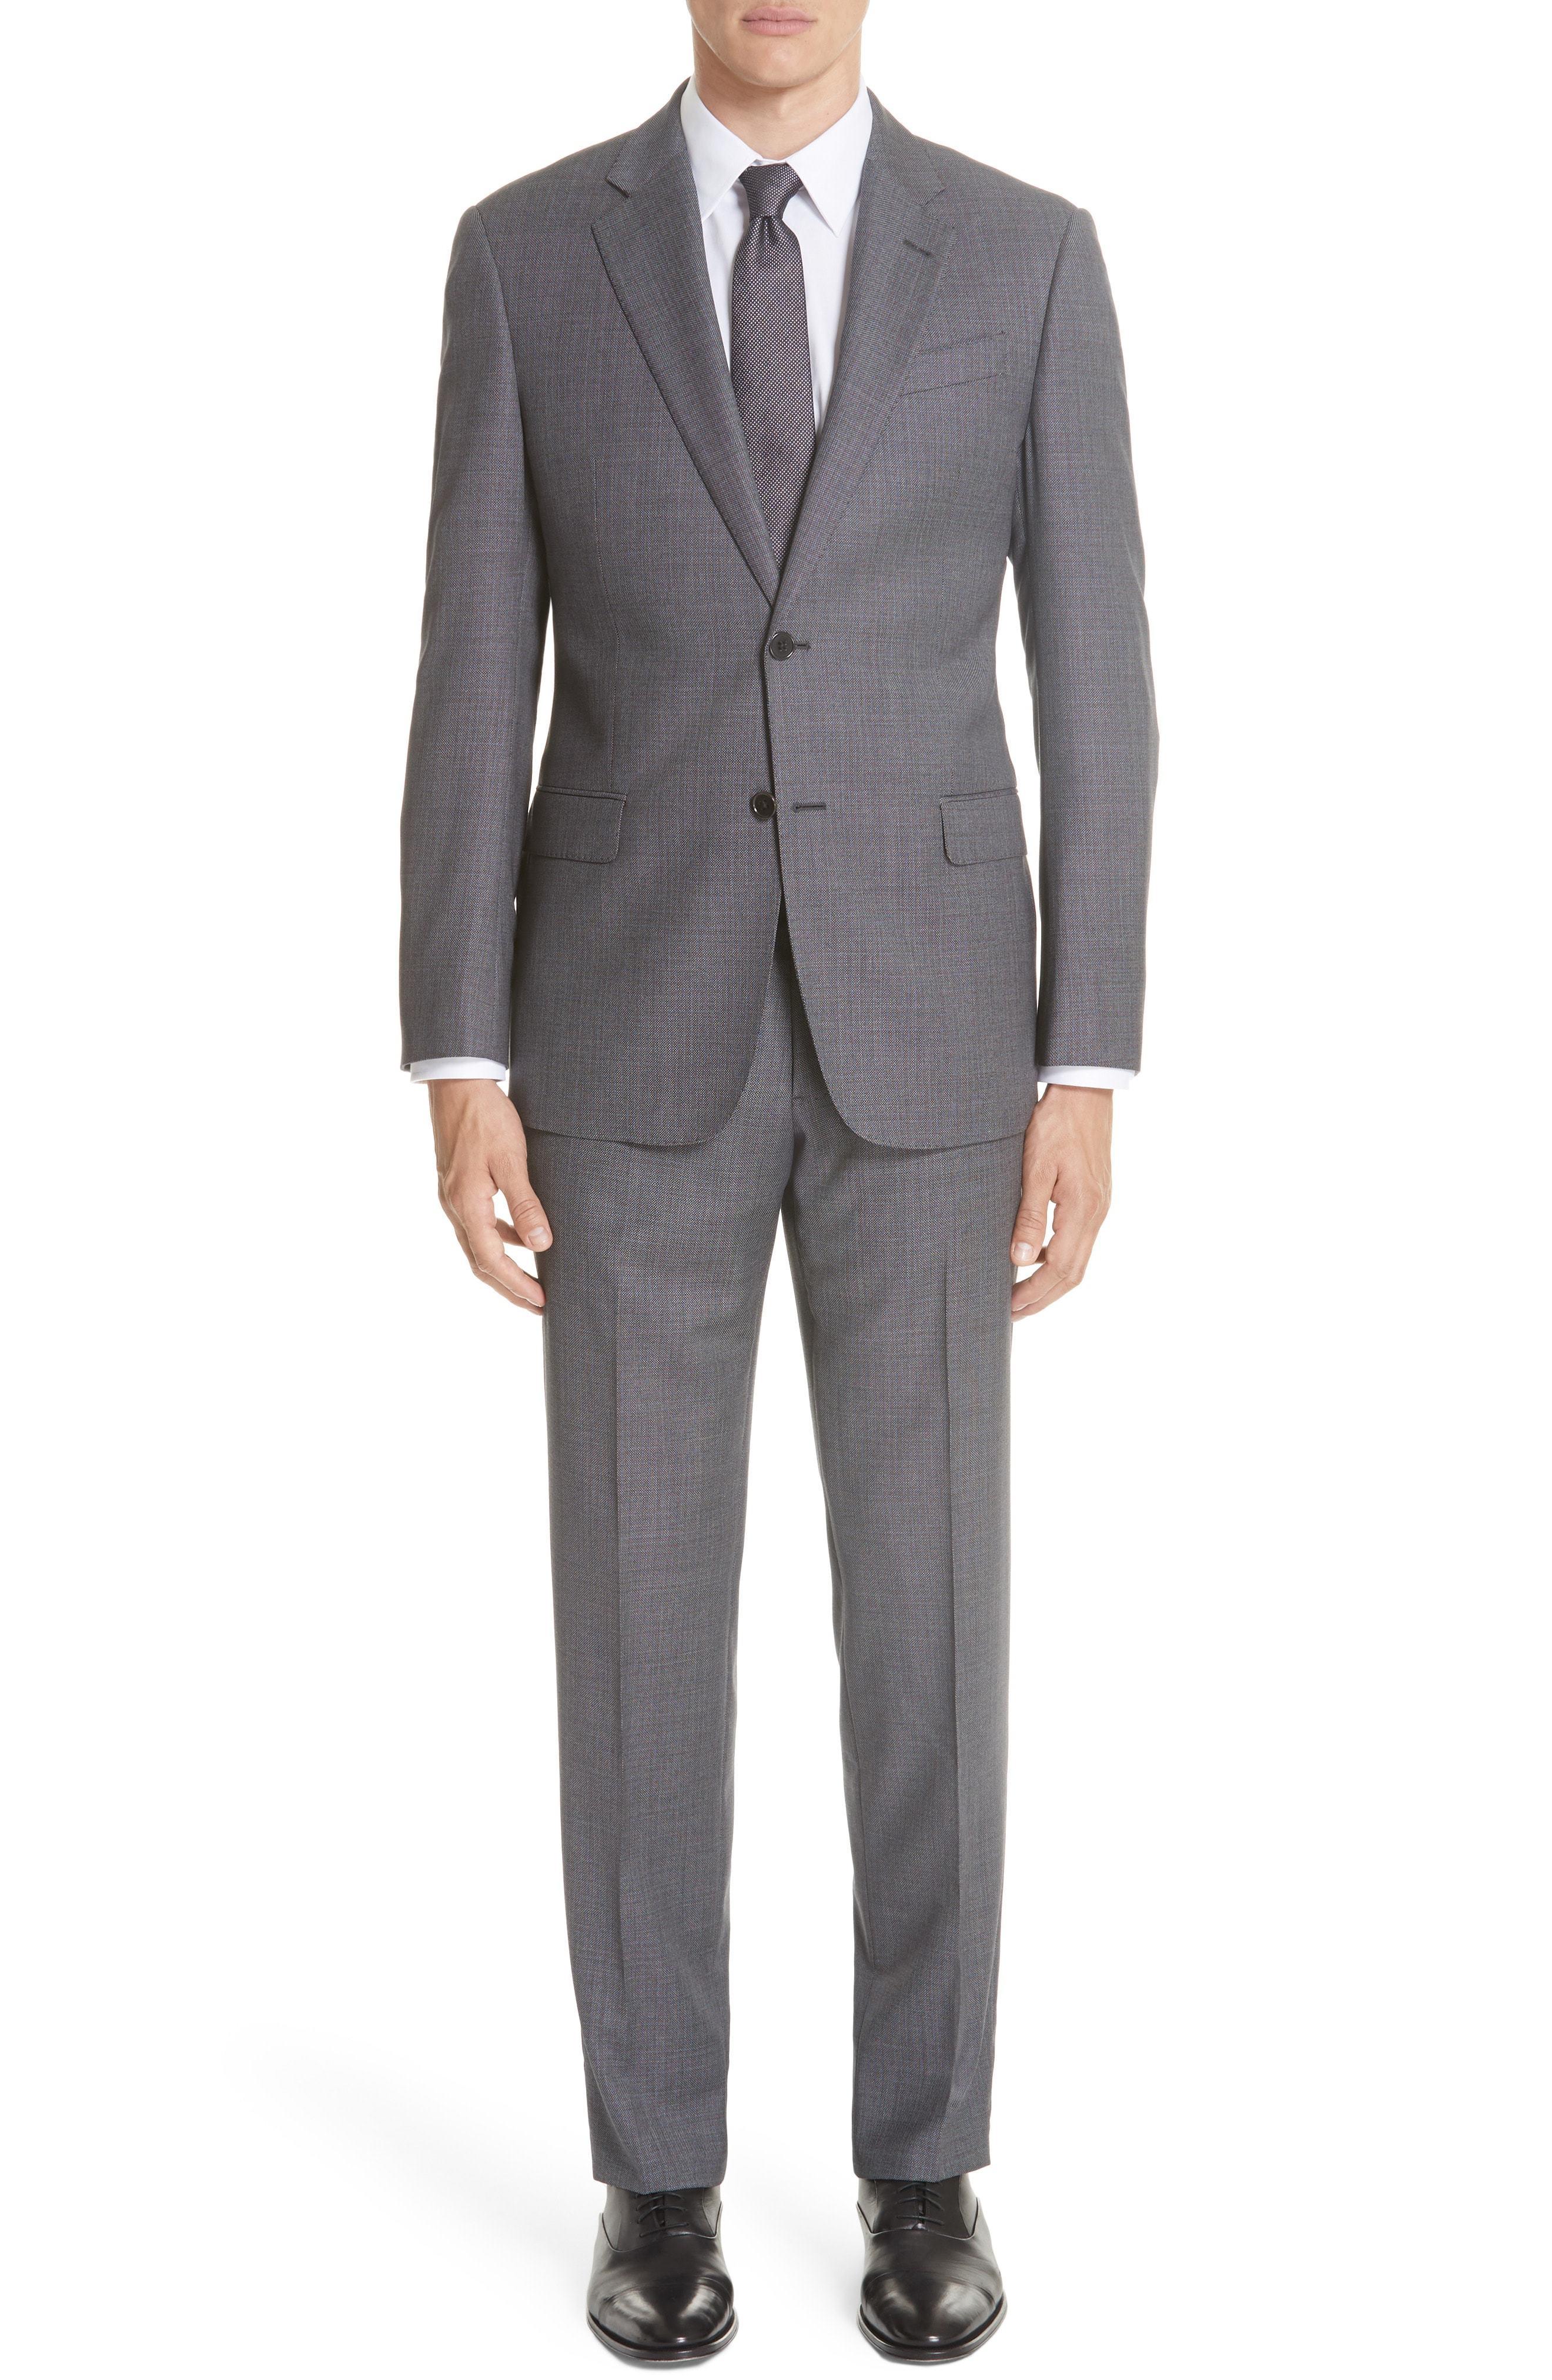 Emporio Armani G Line Trim Fit Birds Eye Wool Suit